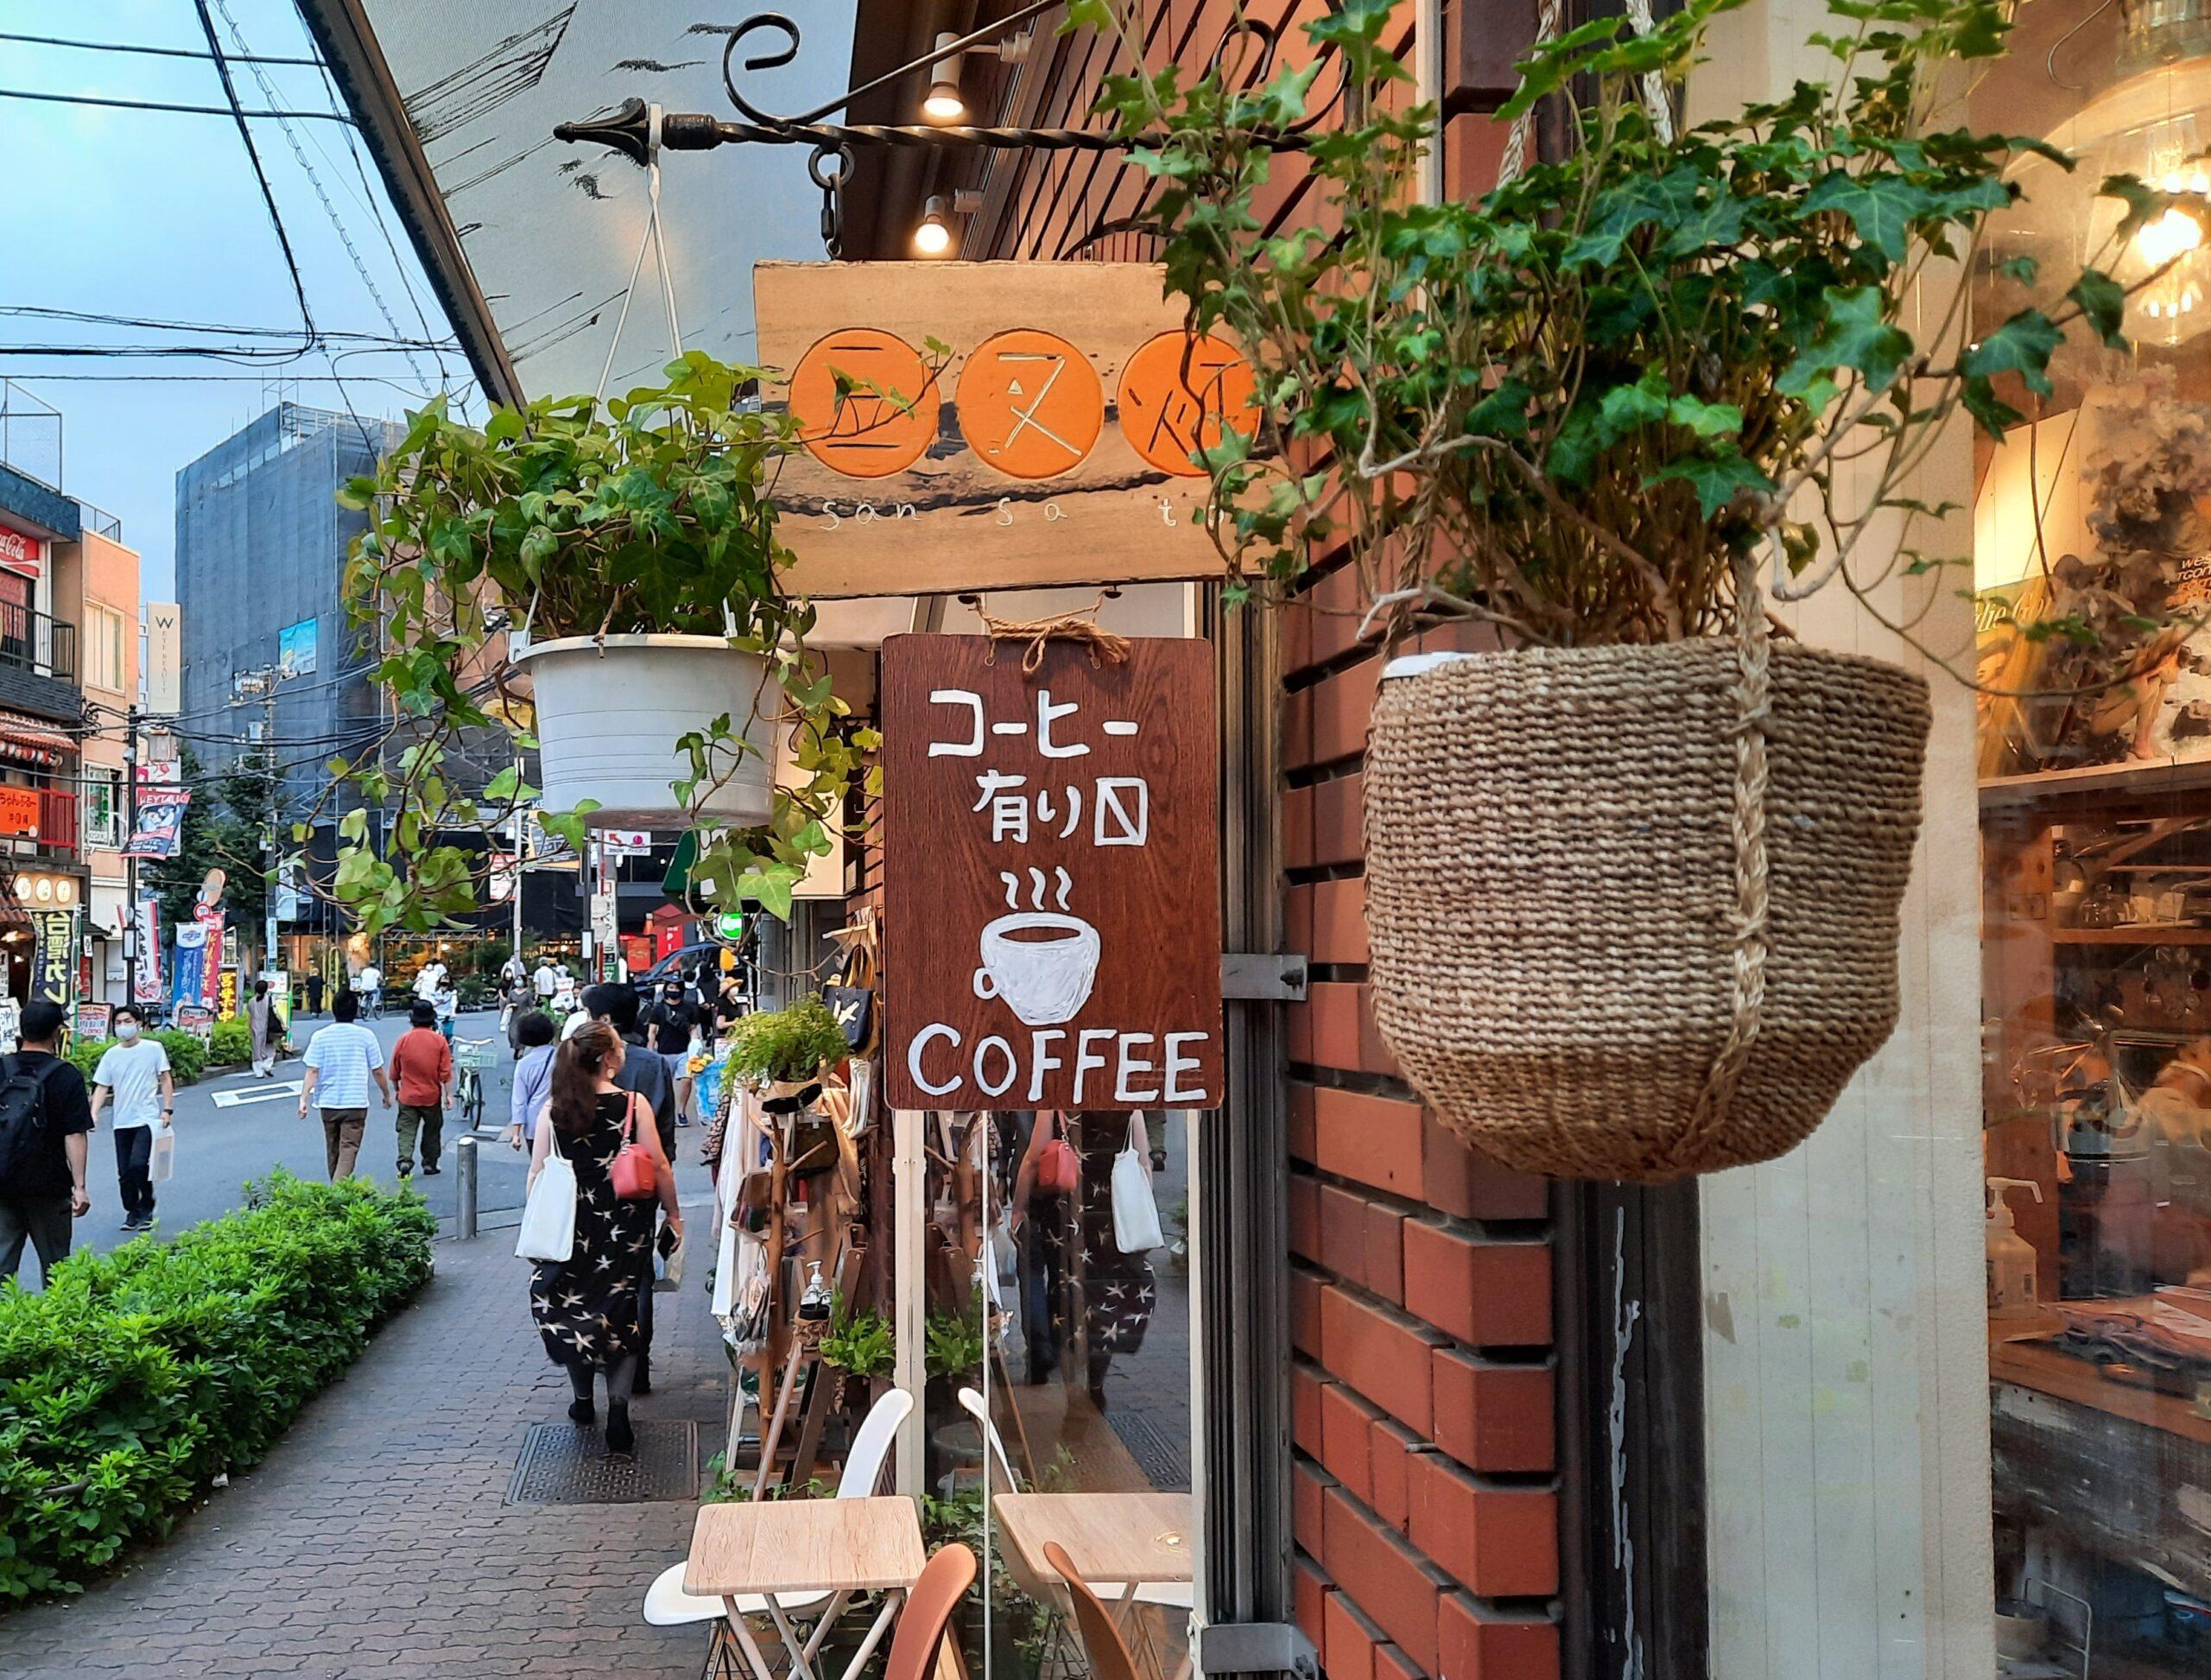 Hier findet man viele individuelle Cafés